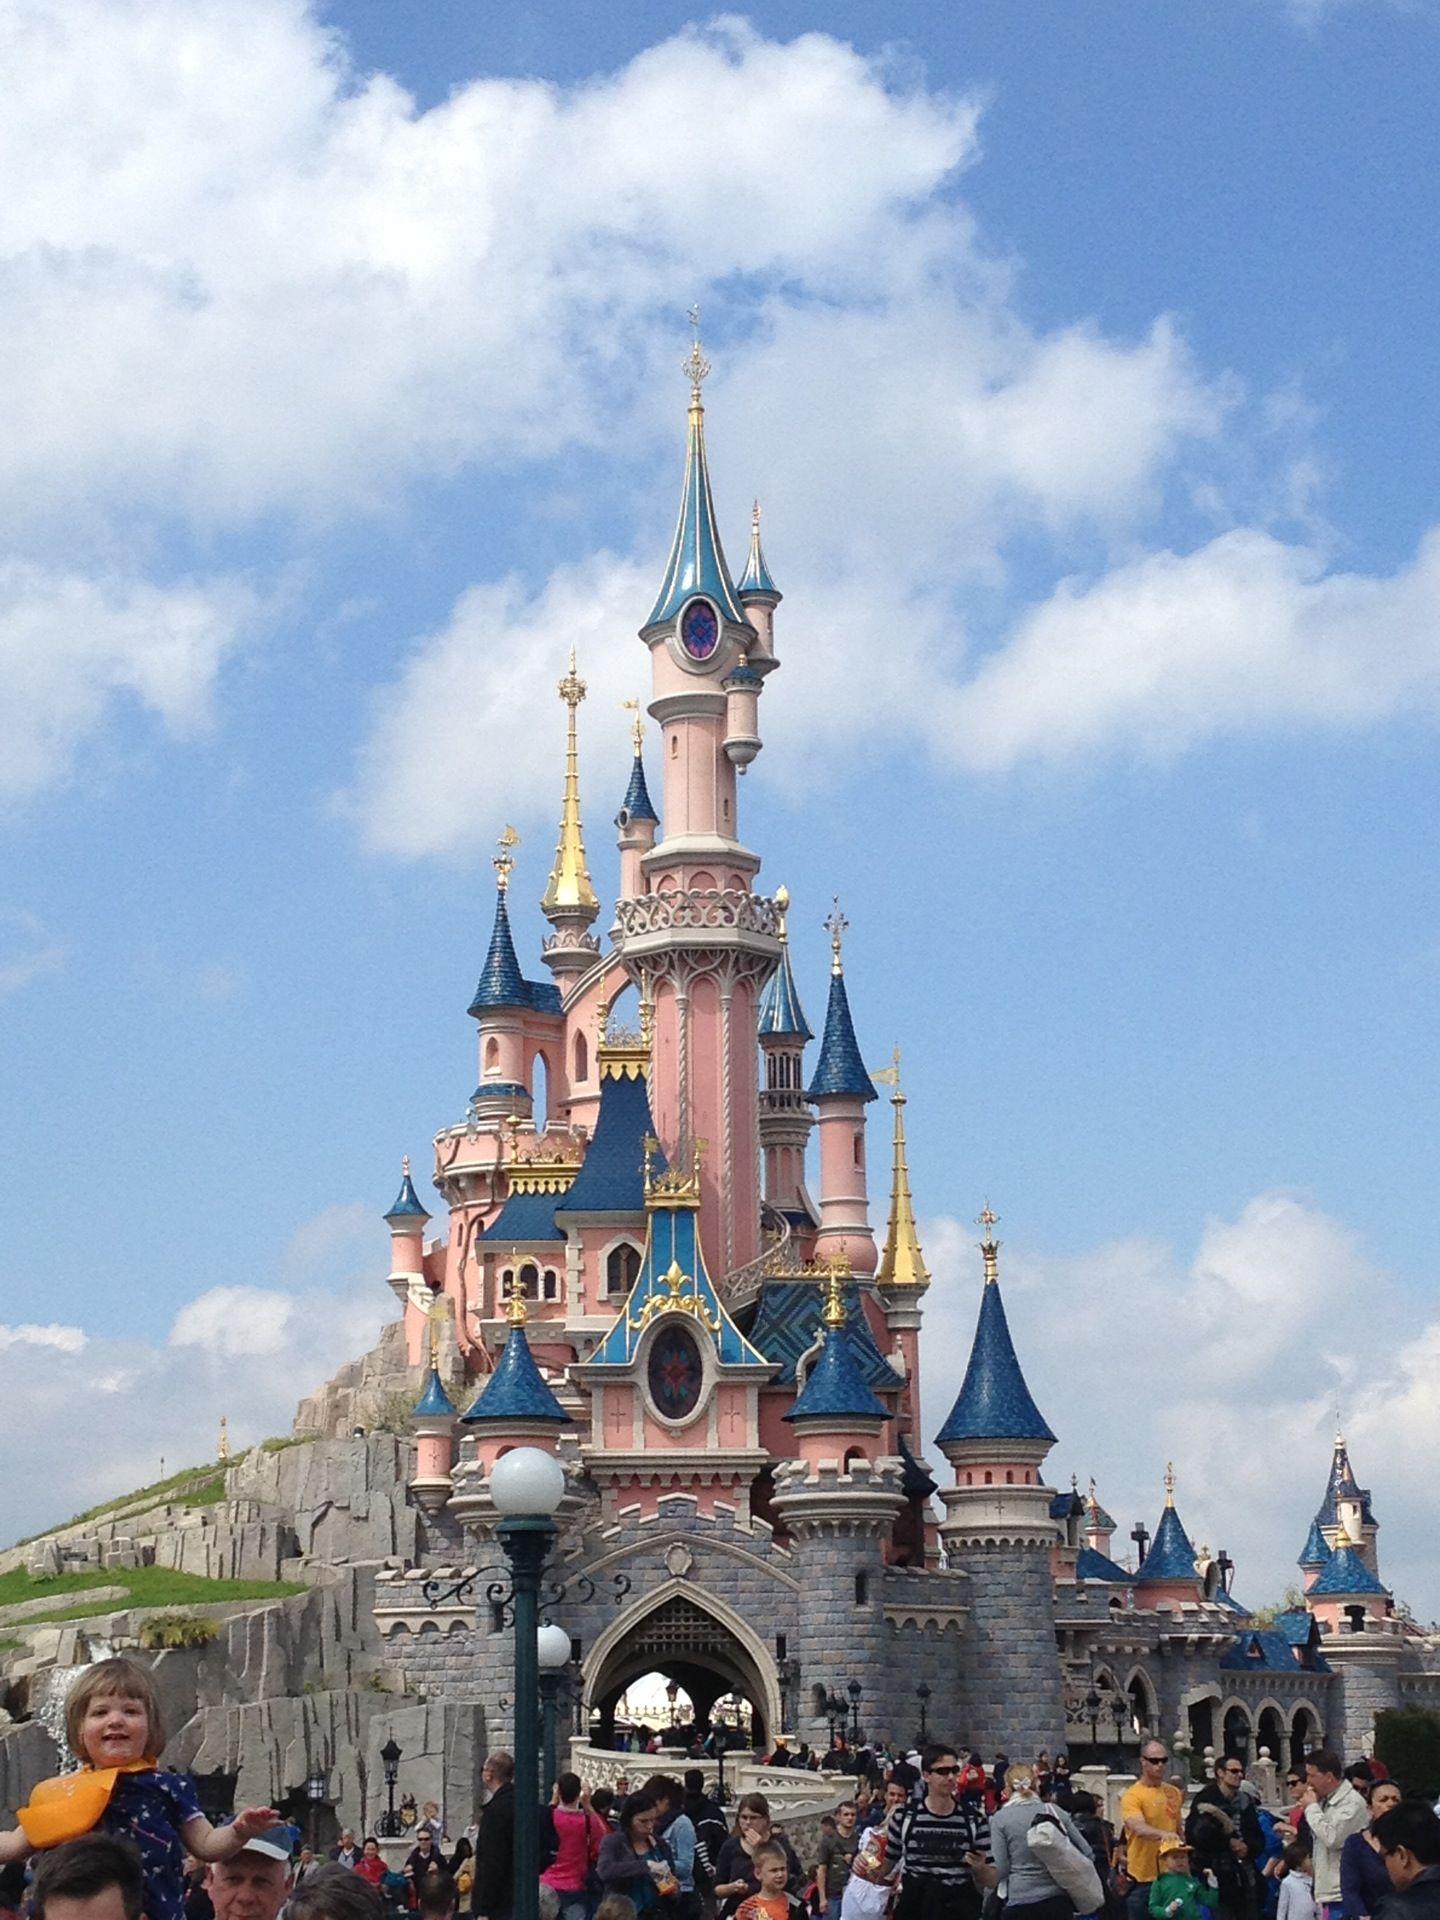 Disneyland Paris In 2019 Ile De France - Seine-marne